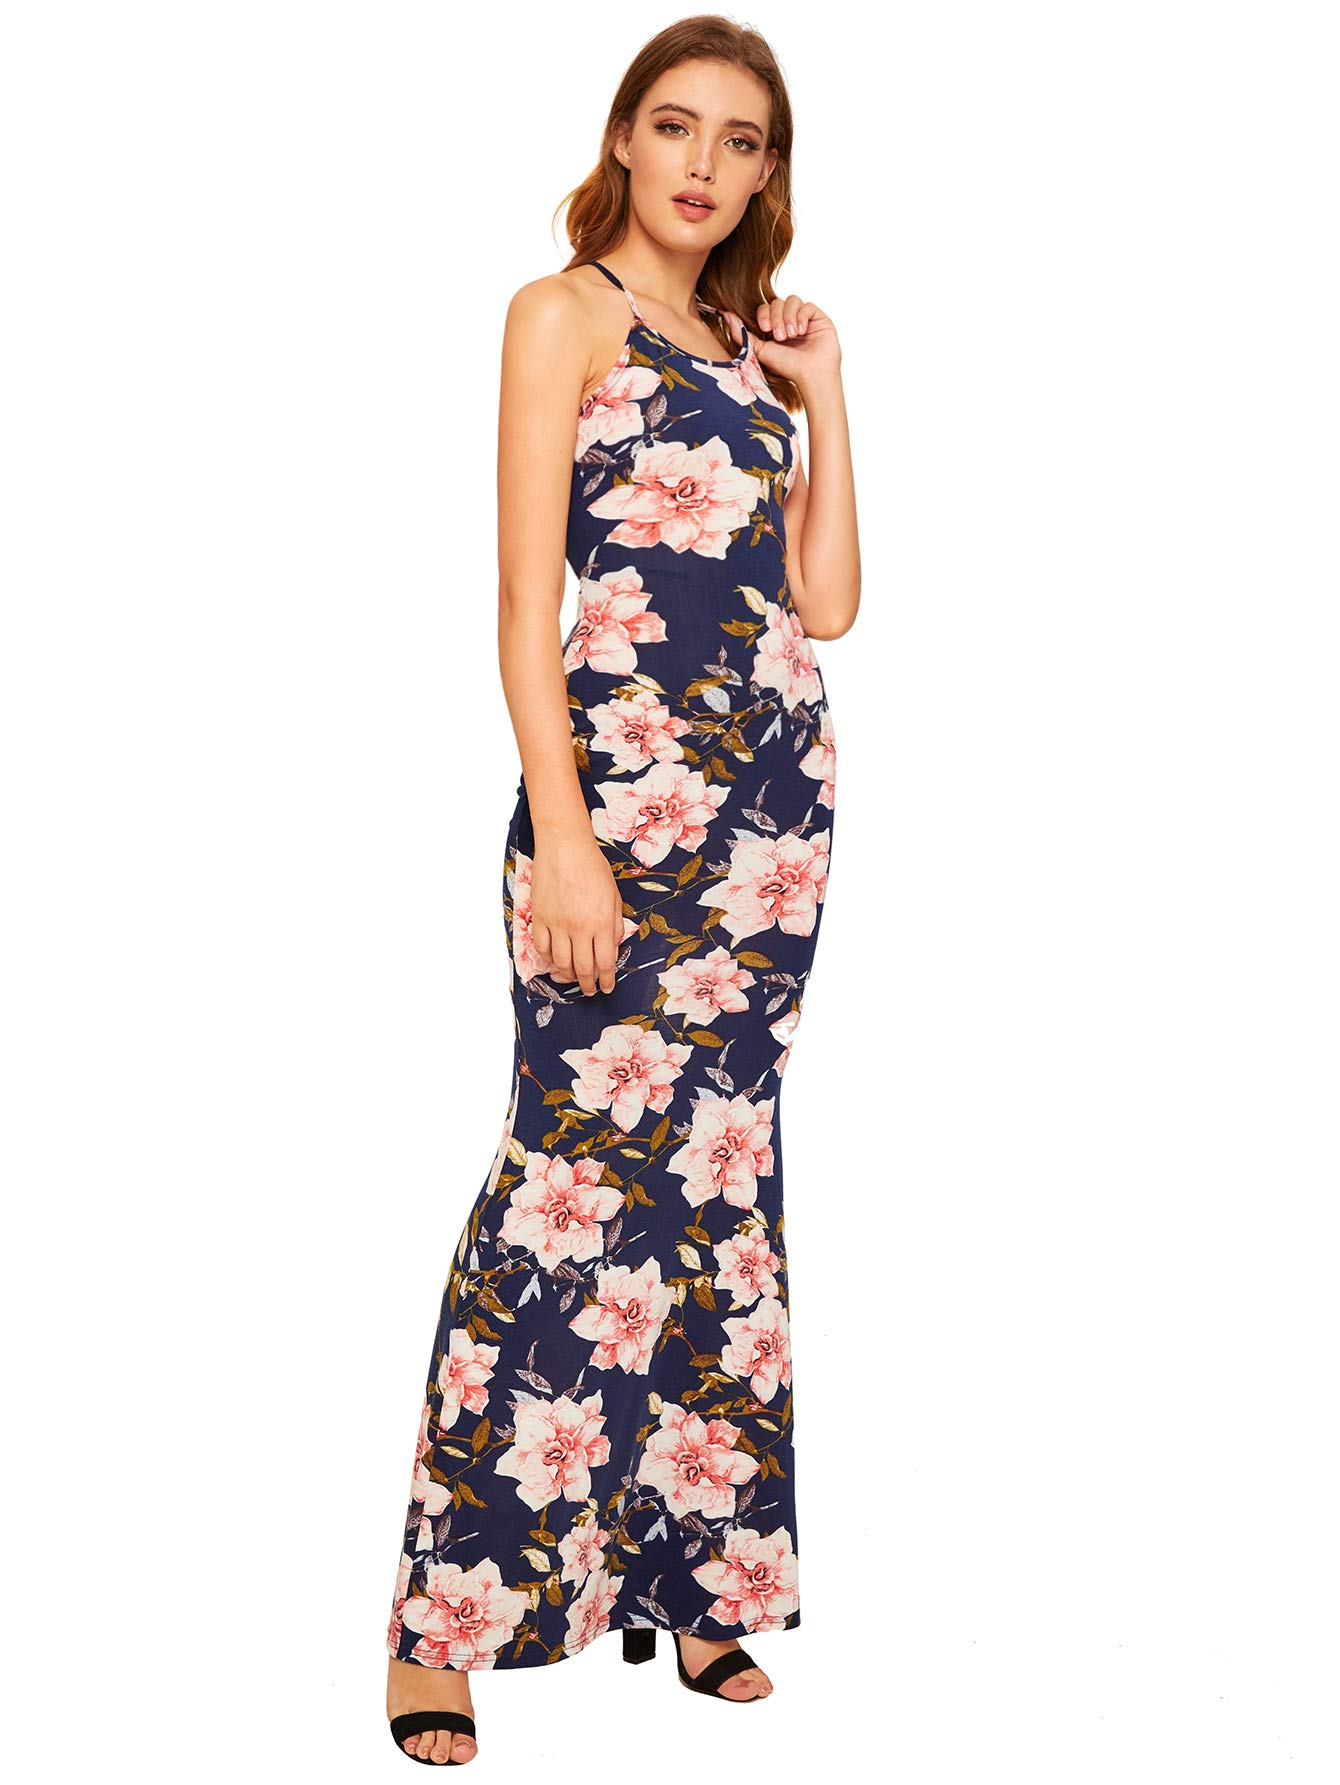 44bad86206 Amazon.com: SheIn: Dress